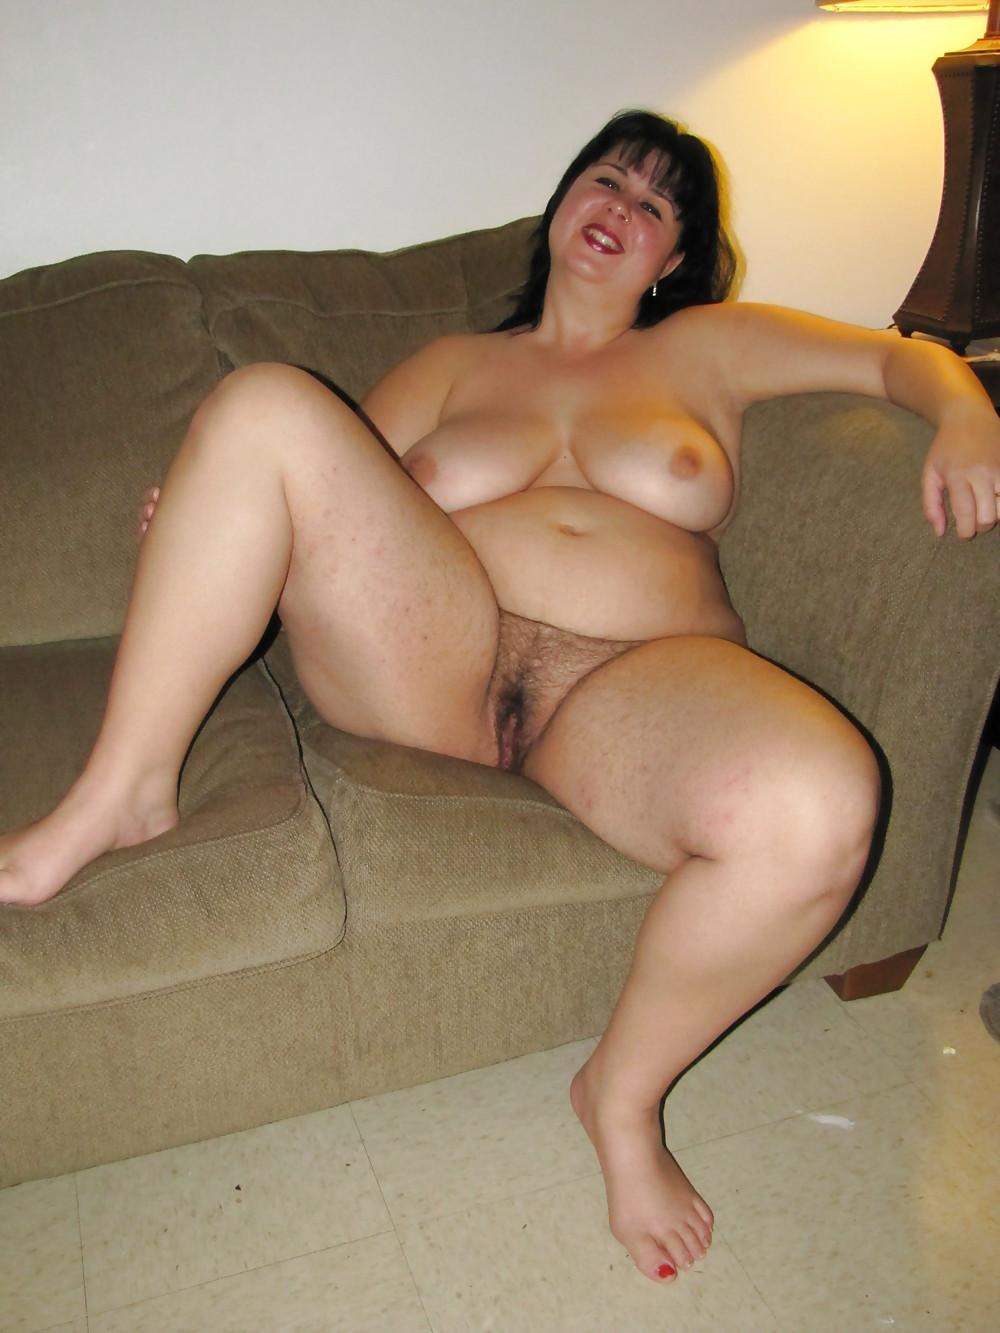 Free nude amateur pantyhose pics